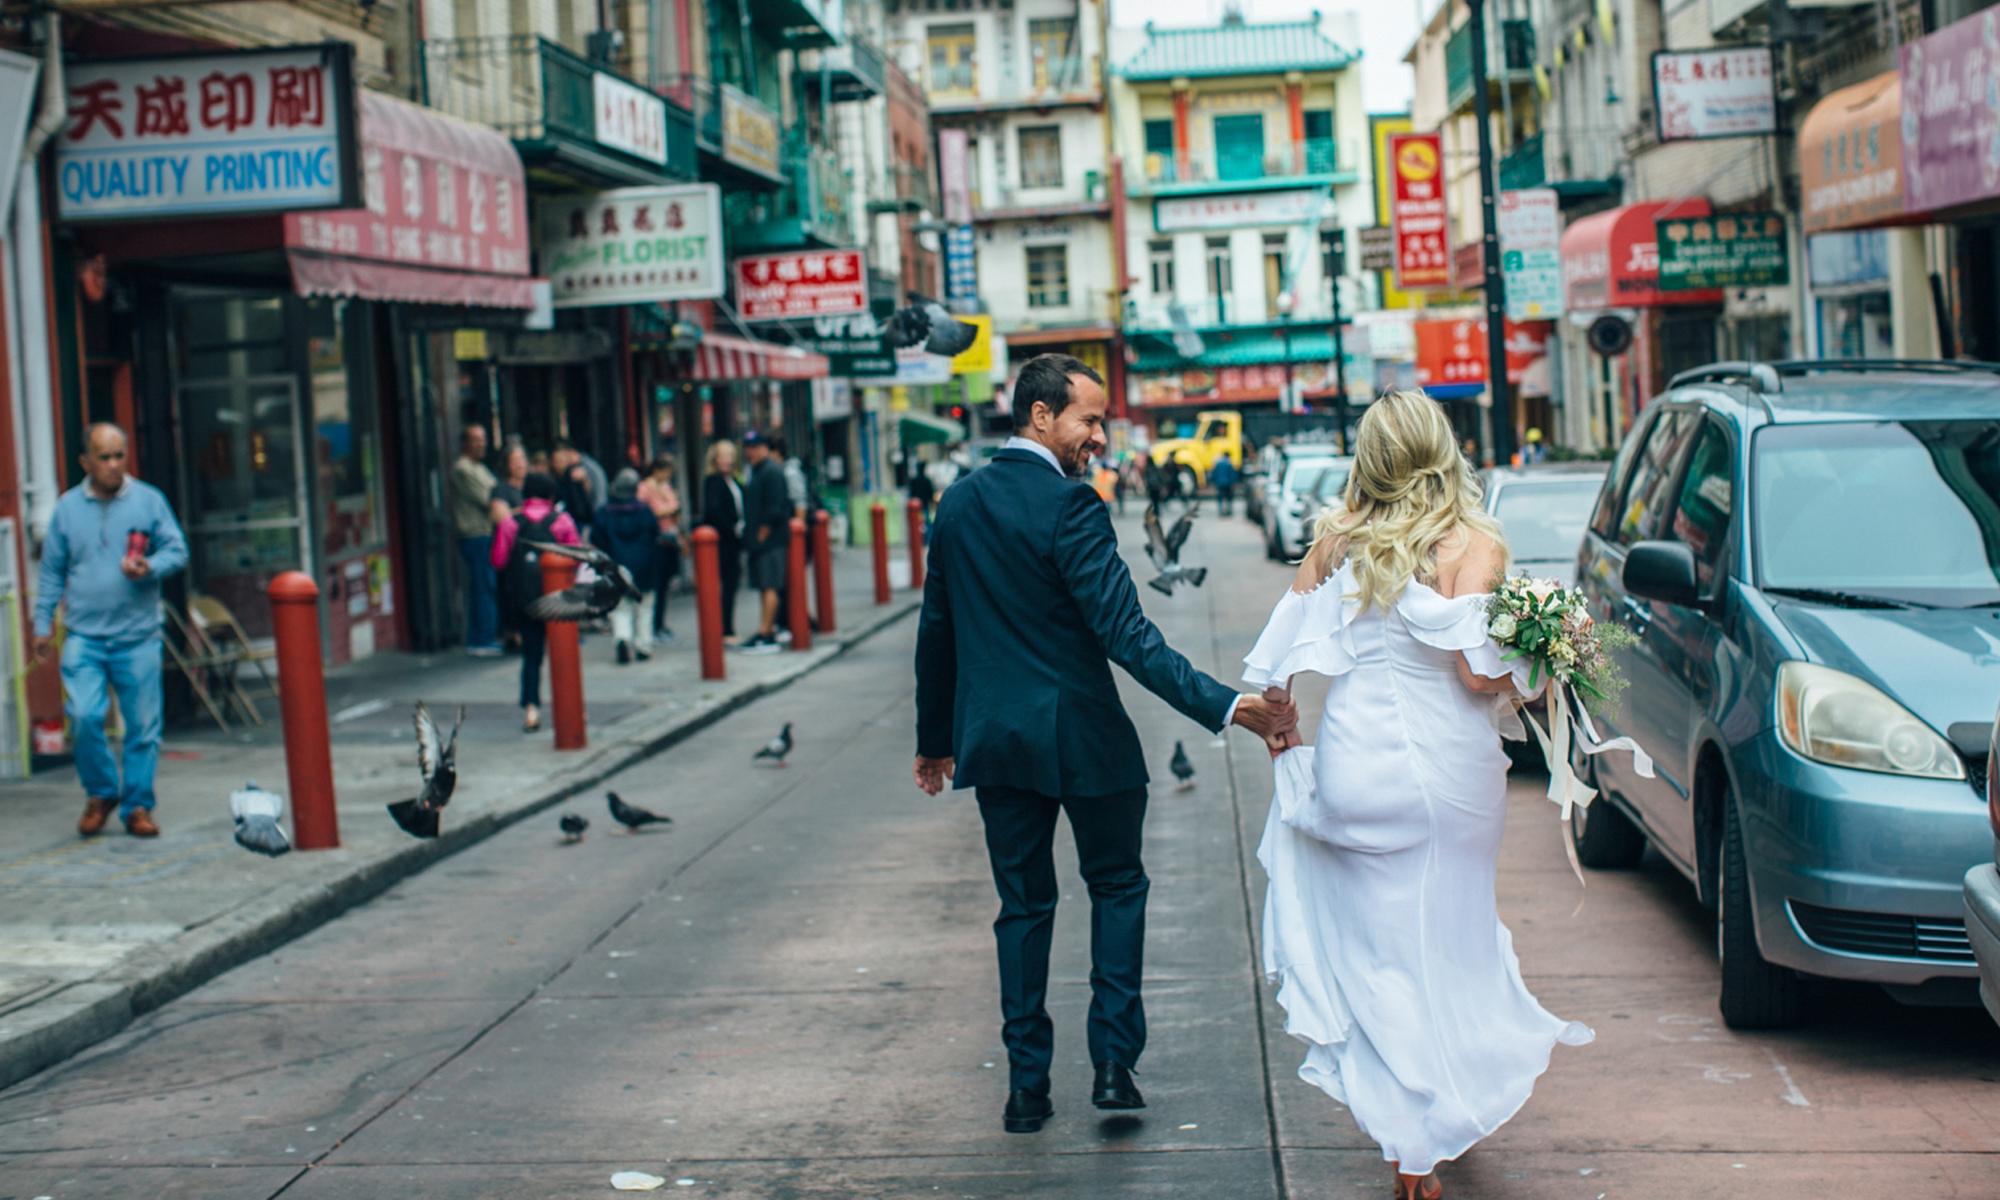 Wedding Photography Tips with Lowepro Storyteller Sarah Dawson